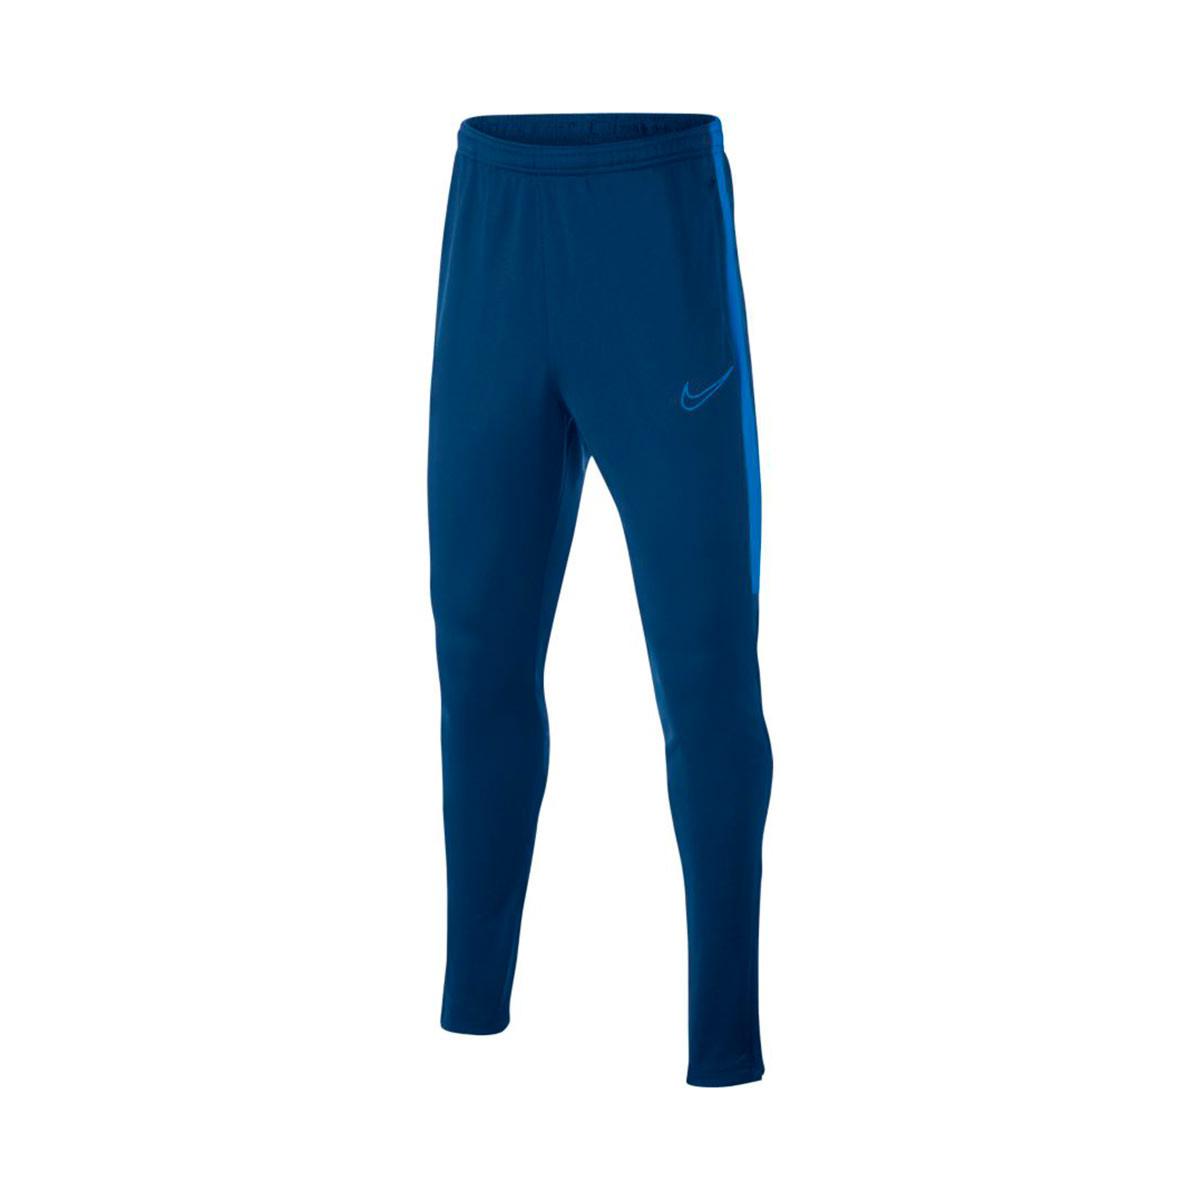 Existencia Sedante Centro de niños  Long pants Nike Dri-FIT Academy Niño Coastal blue-Light photo blue -  Football store Fútbol Emotion